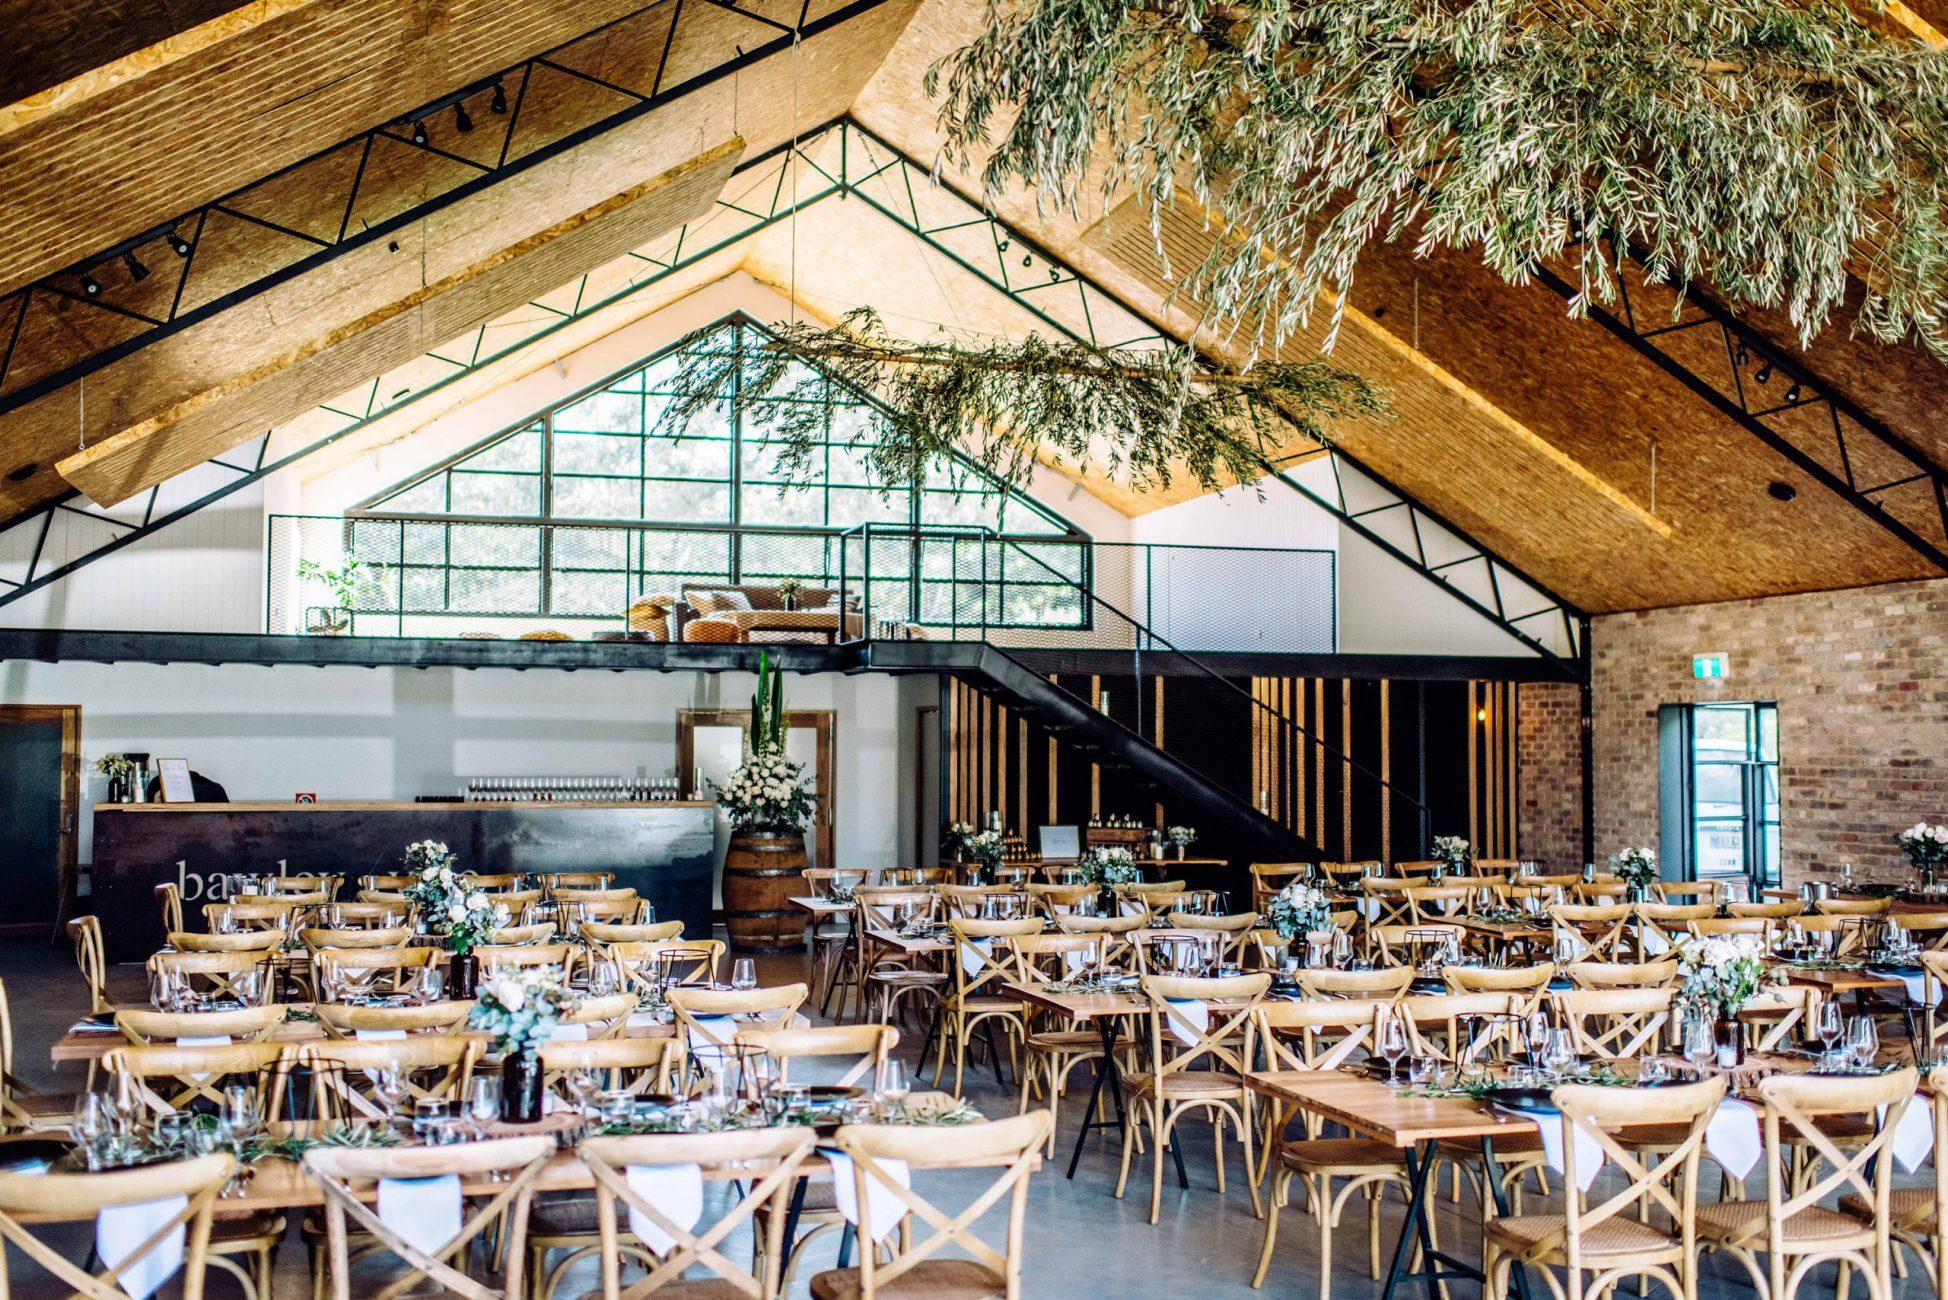 Wedding Barn styled for rustic reception